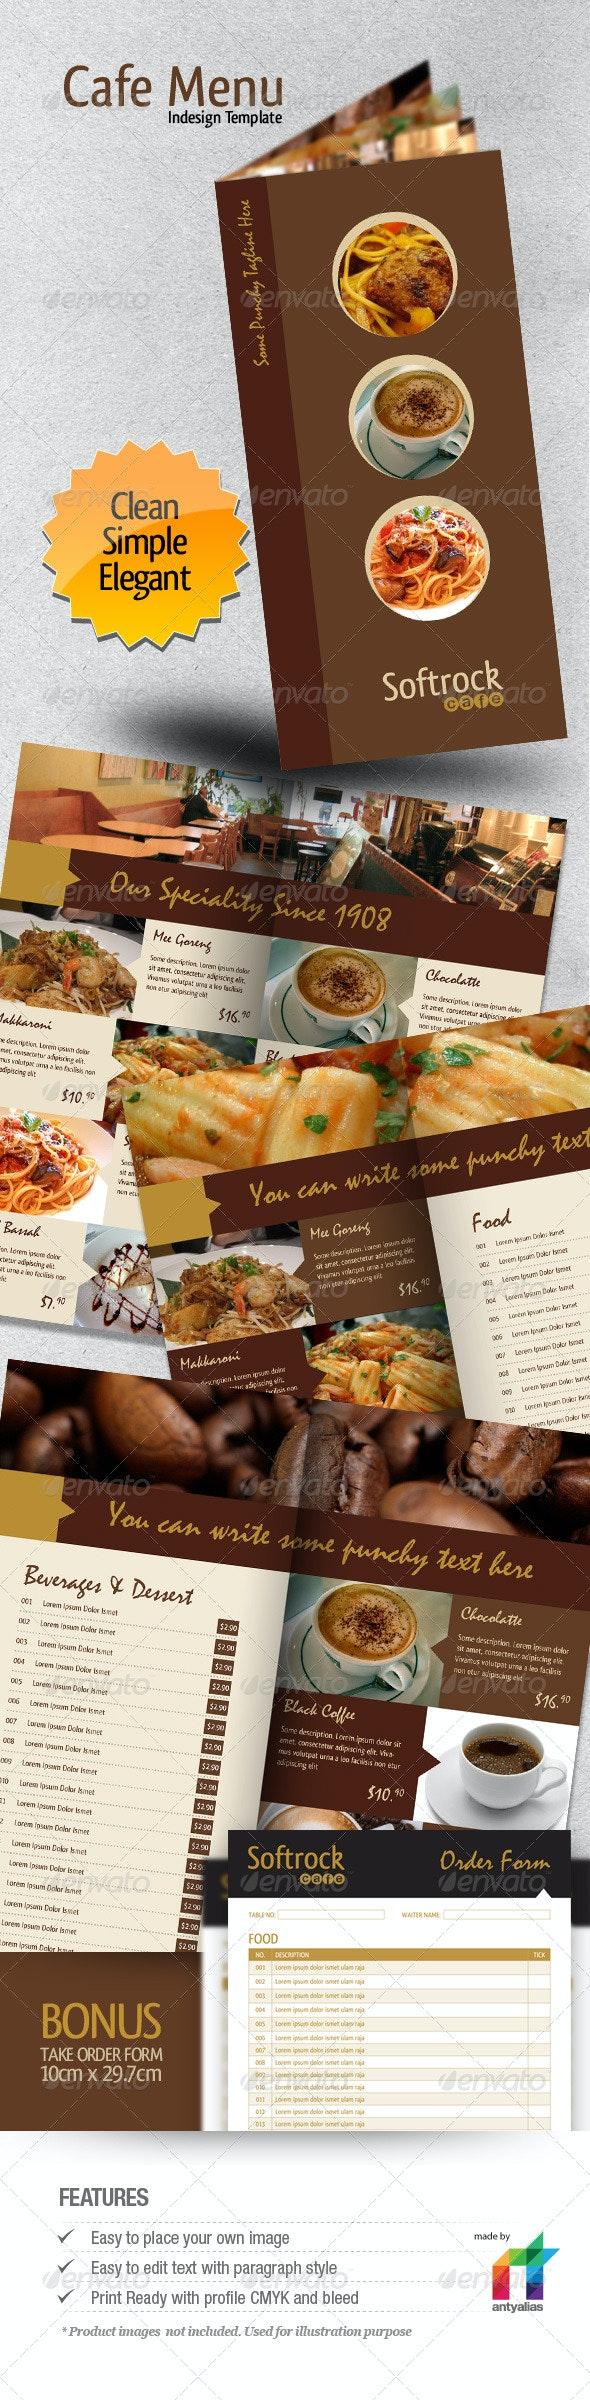 Cafe Menu Indesign Template - Food Menus Print Templates